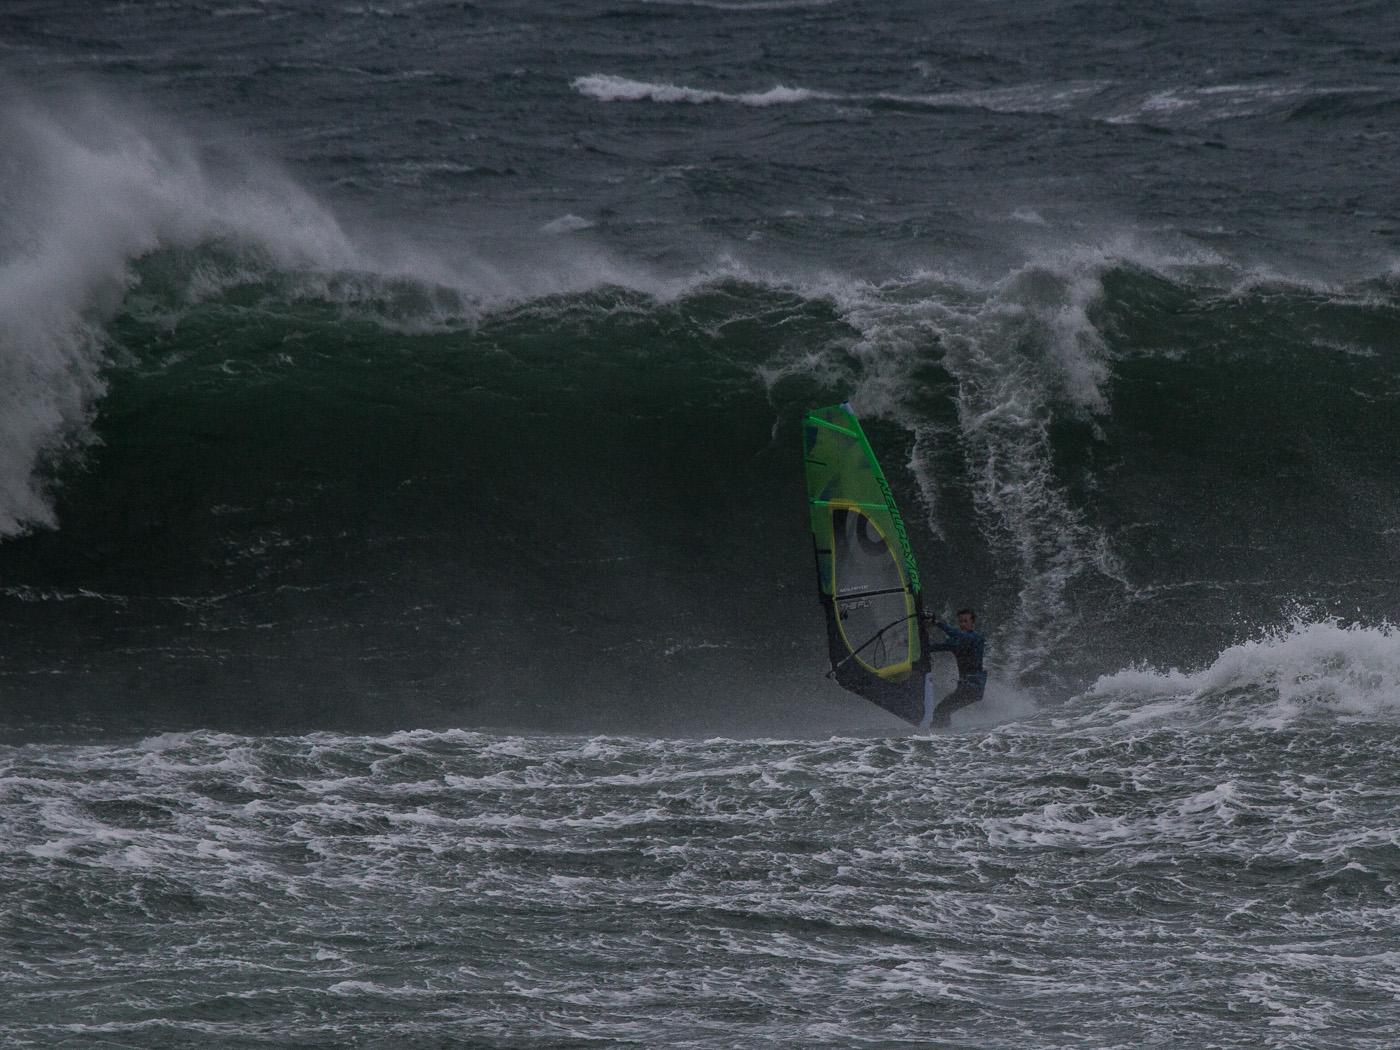 big waves windsurfing at woolamai phillip island